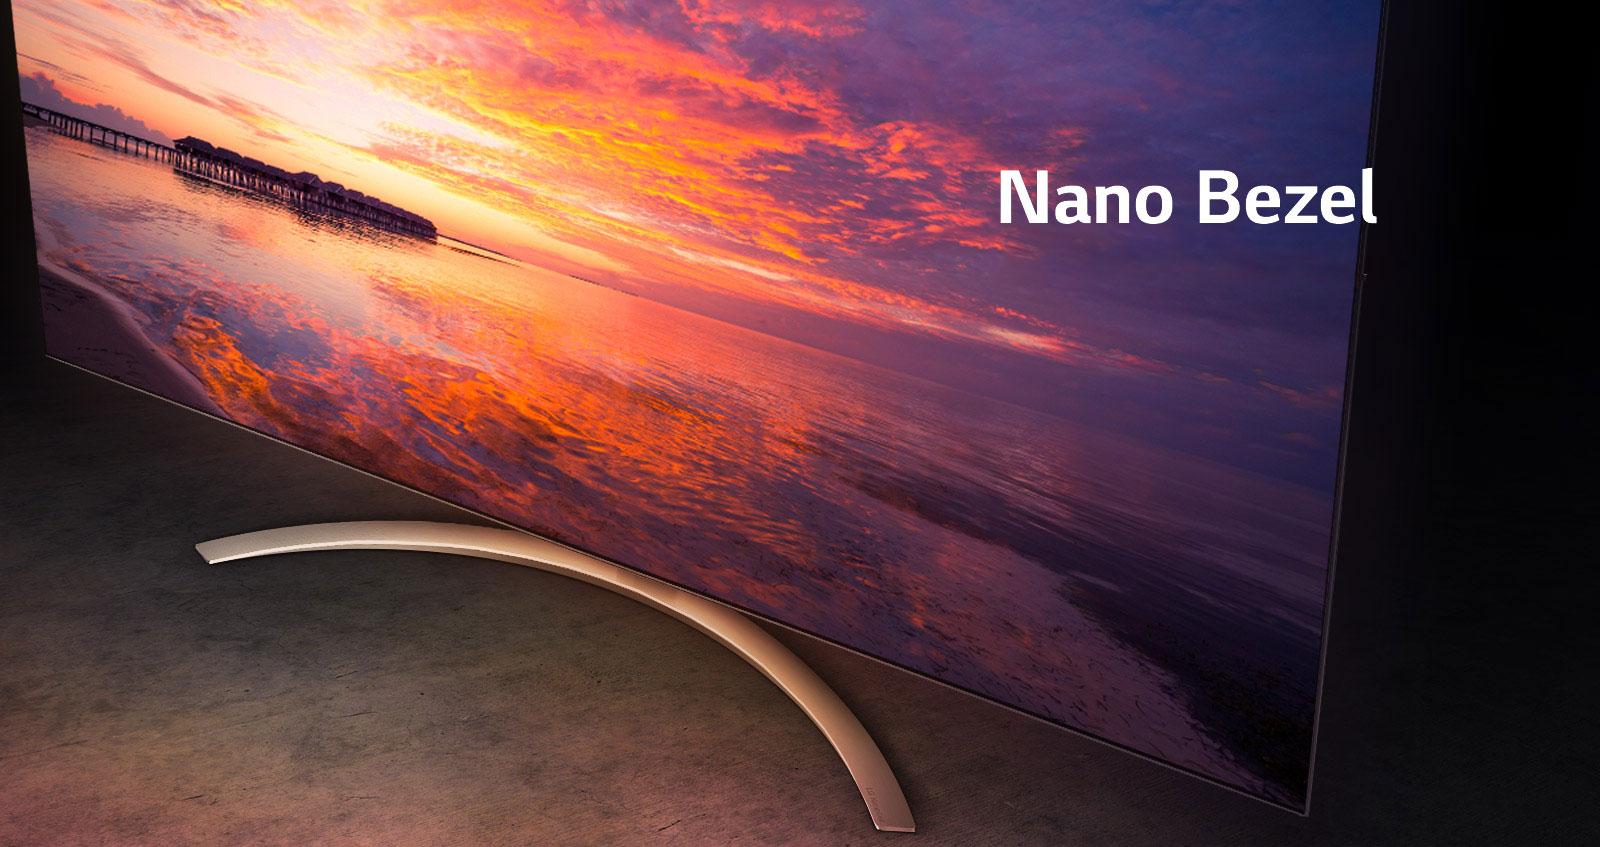 TV-NanoCell-SM82-11-Nano-Bezel-Desktop_V03